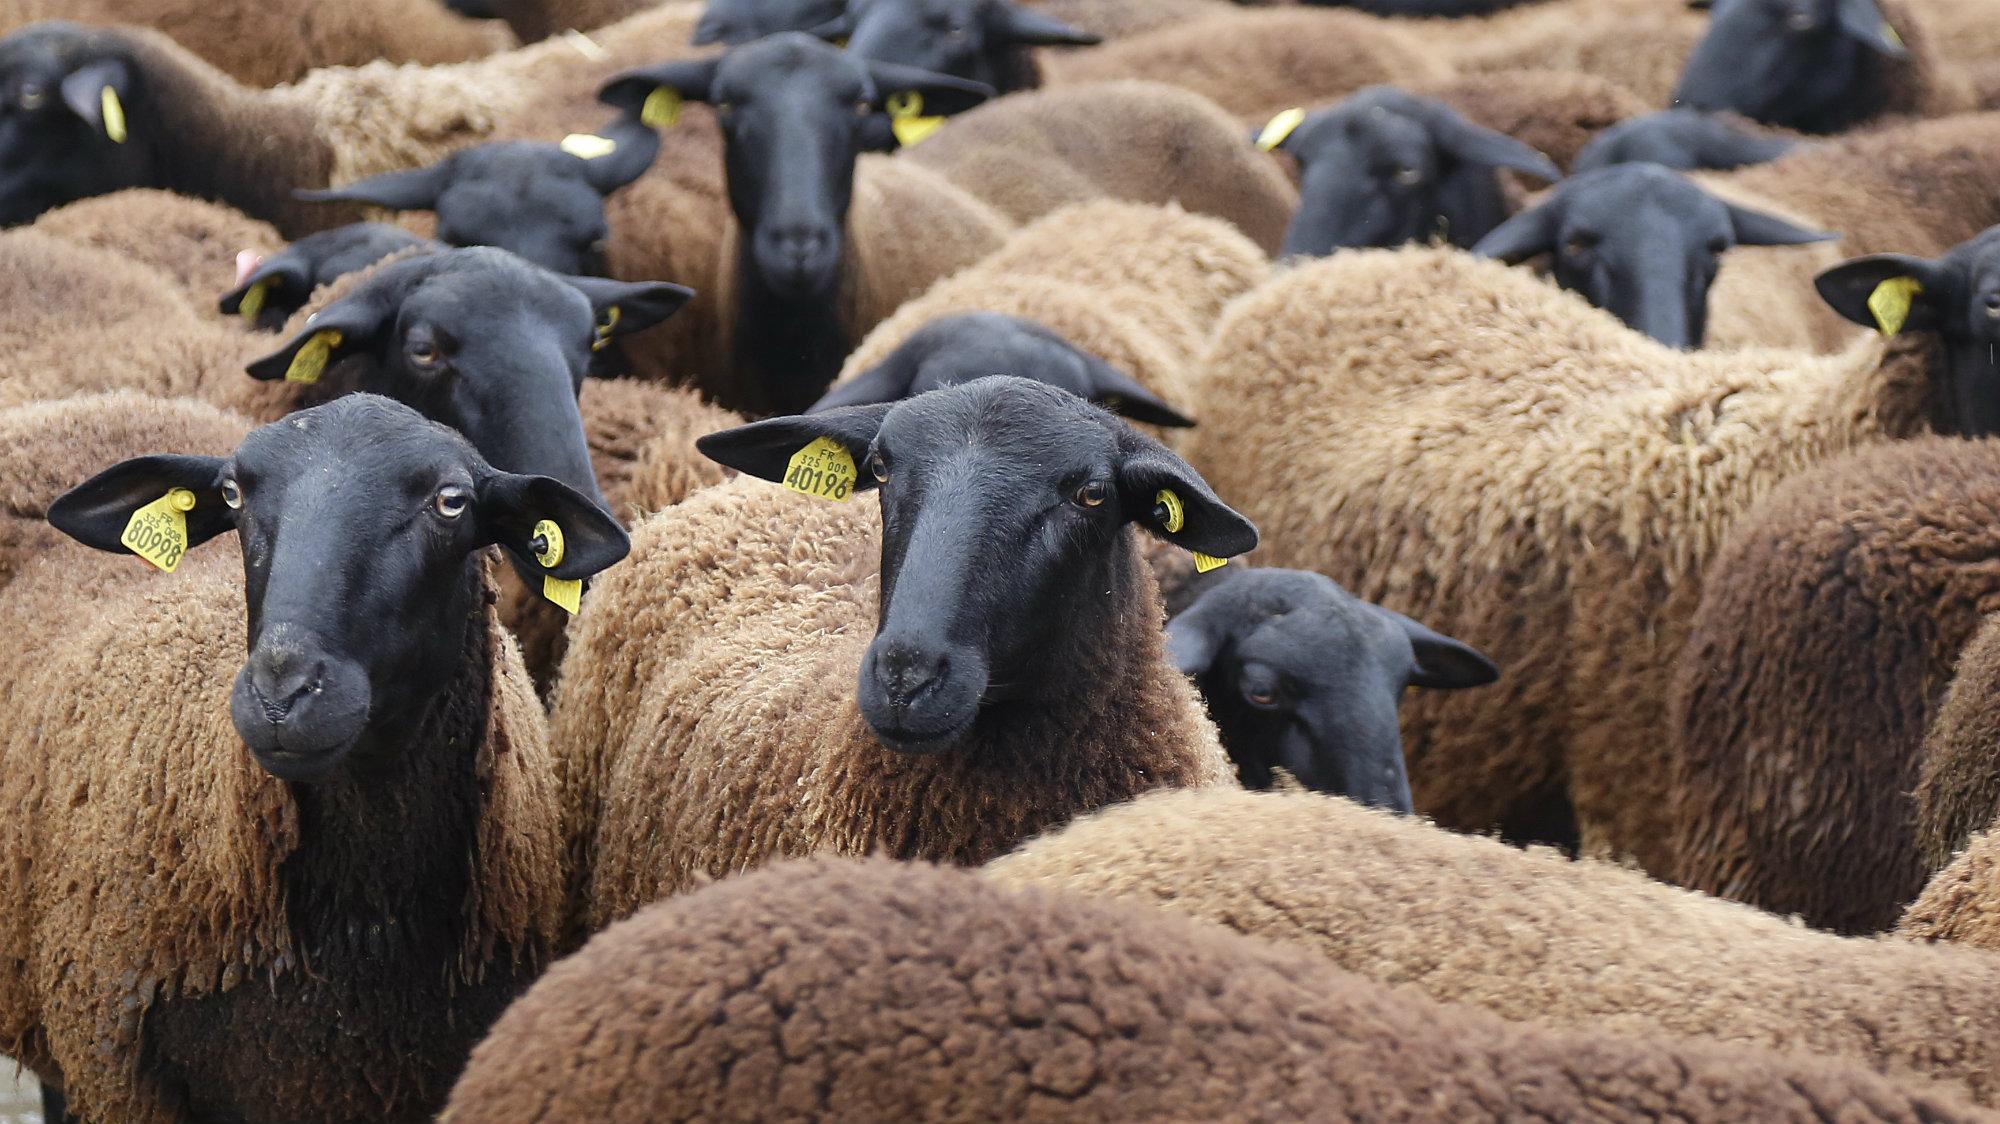 Velay black sheep gather in Paris during a shepherds' demonstration.